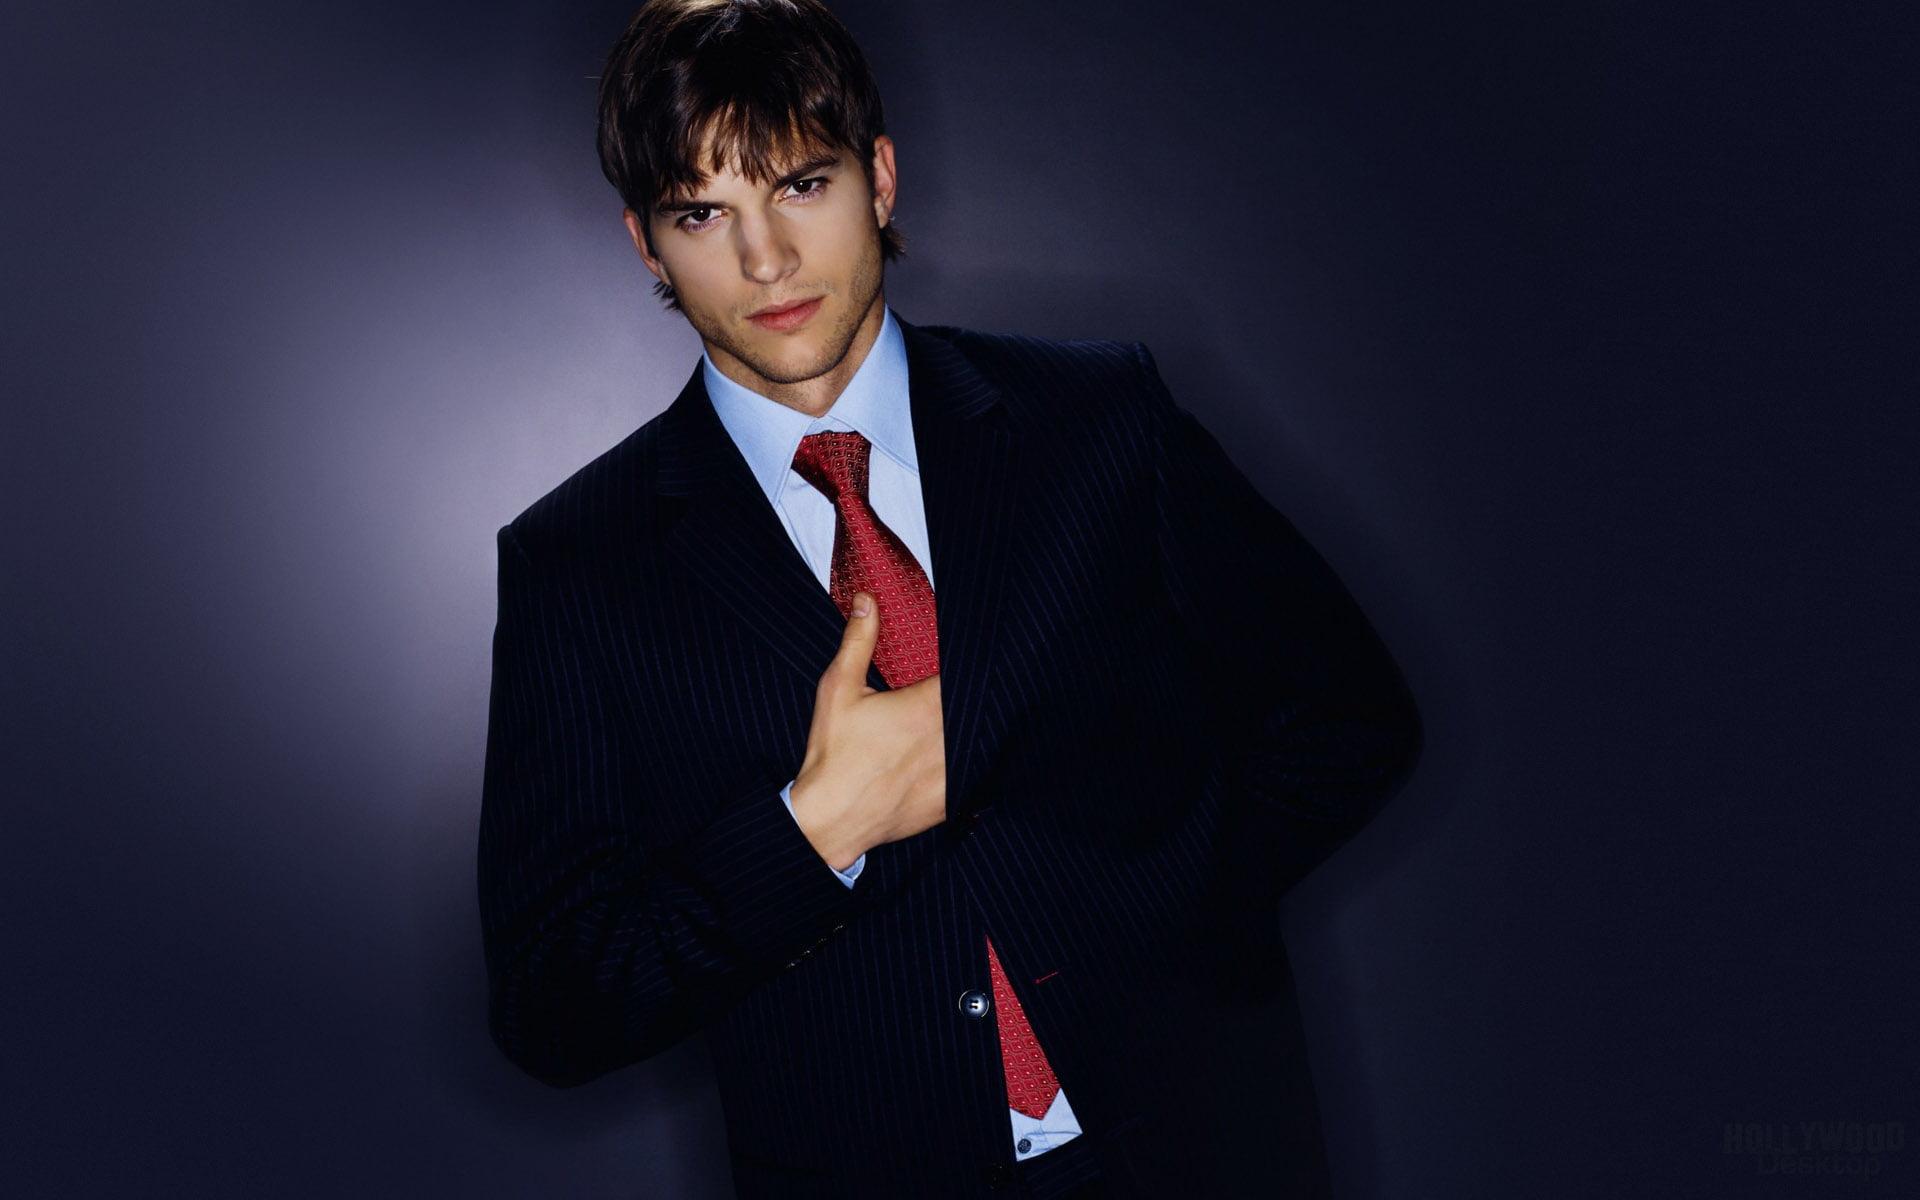 HD wallpaper Ashton Kutcher Wearing Suite Ashton Kutcher Male 1920x1200